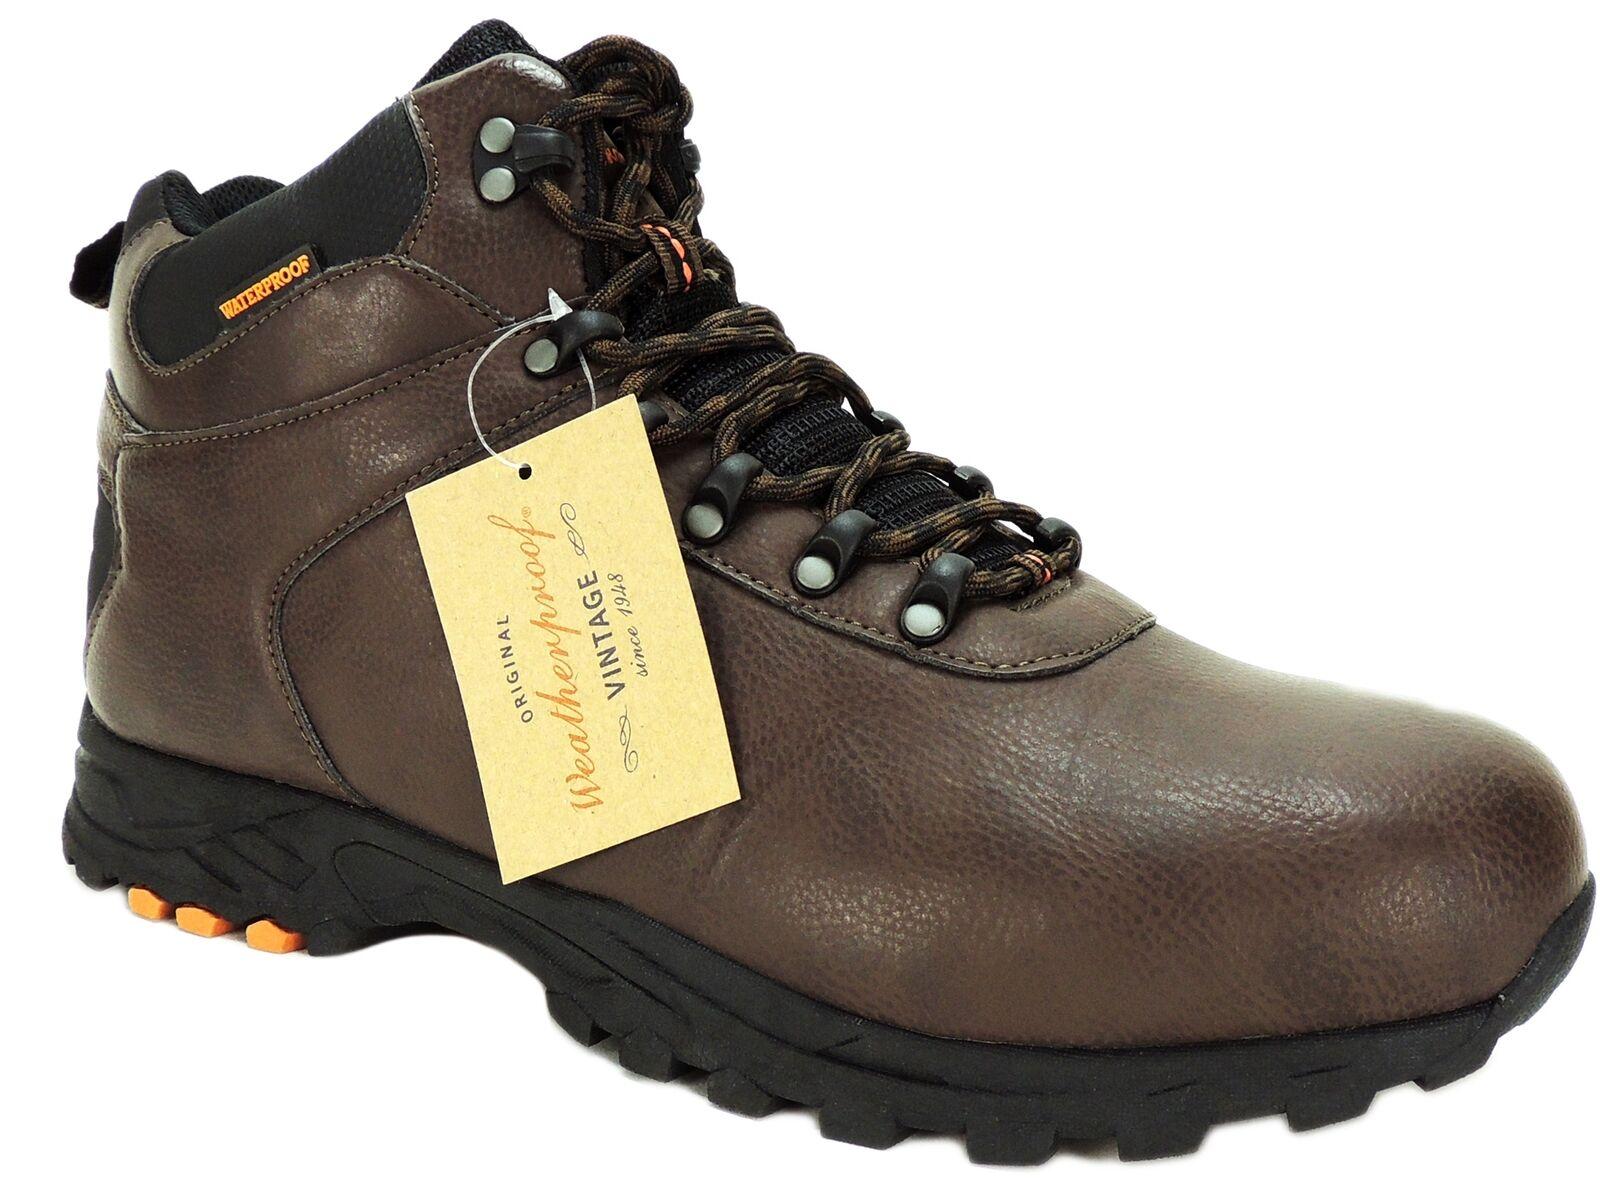 Weatherproof Vintage Men's Jason Waterproof Hikers Boots Brown Leather Size 13 M